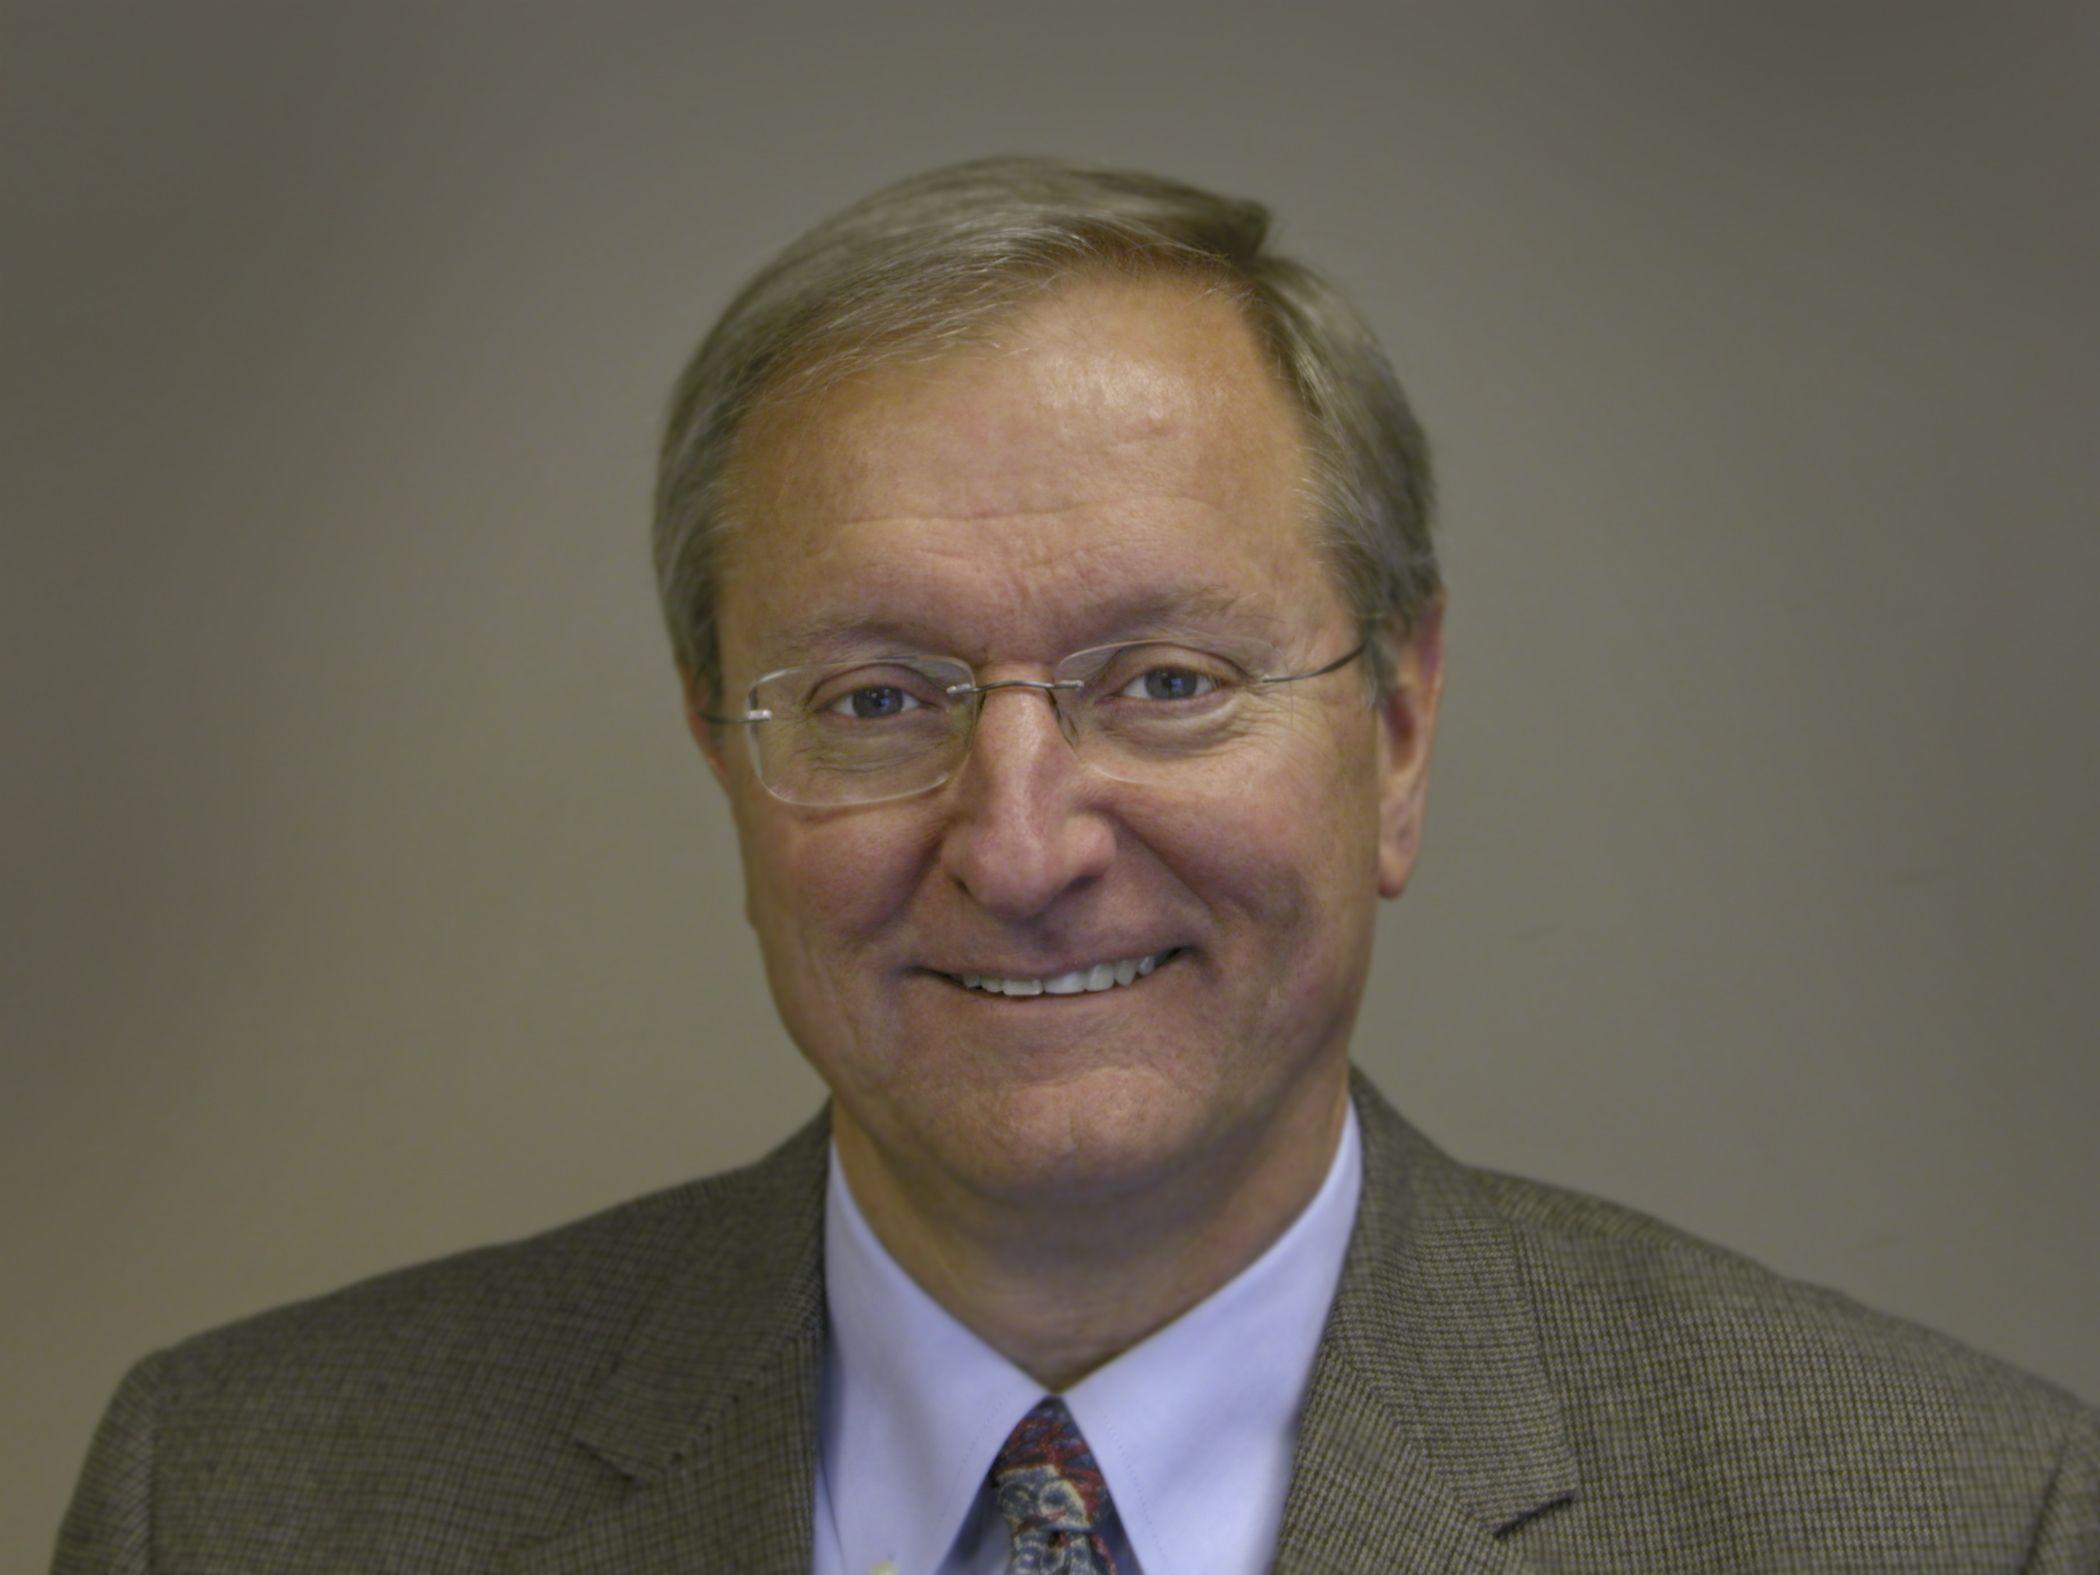 Gary Lederer appointed leader of Honeywell Life Safety